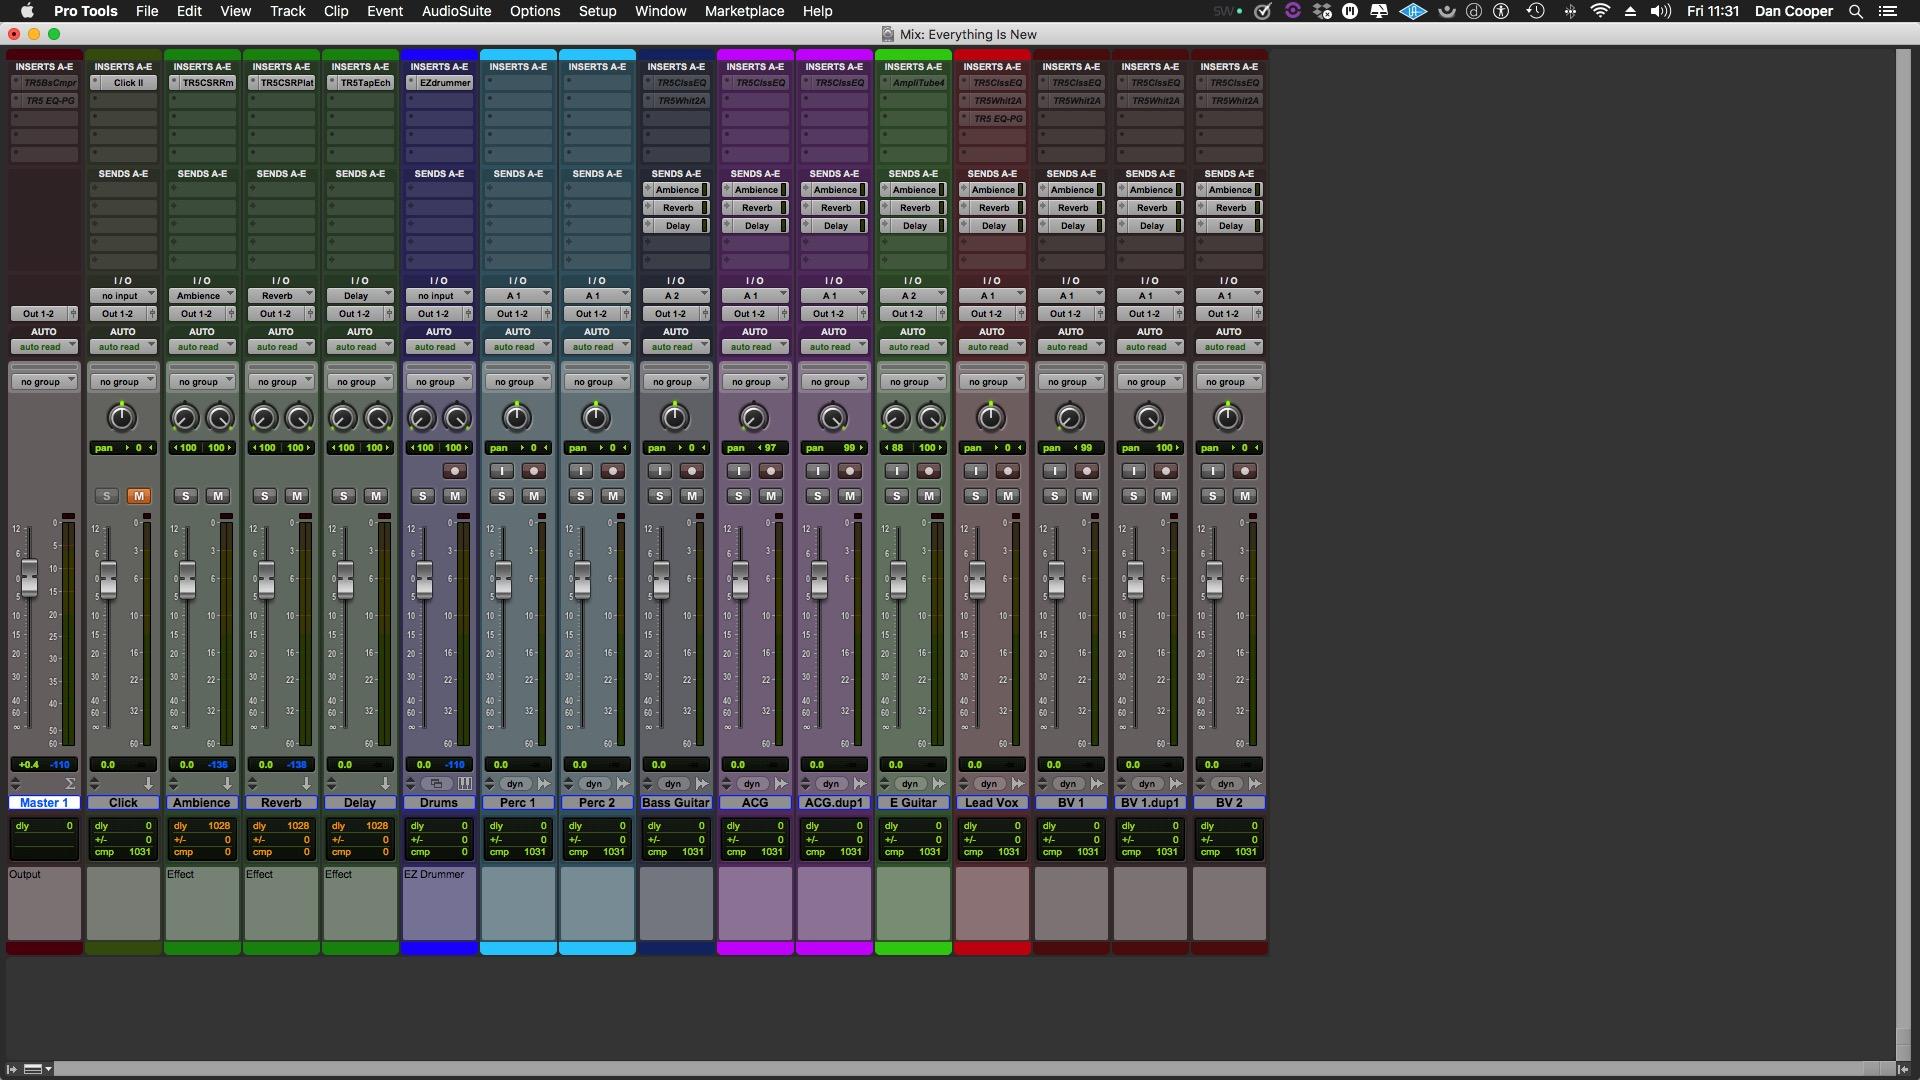 pro tools session template custom songwriter mix window.jpg